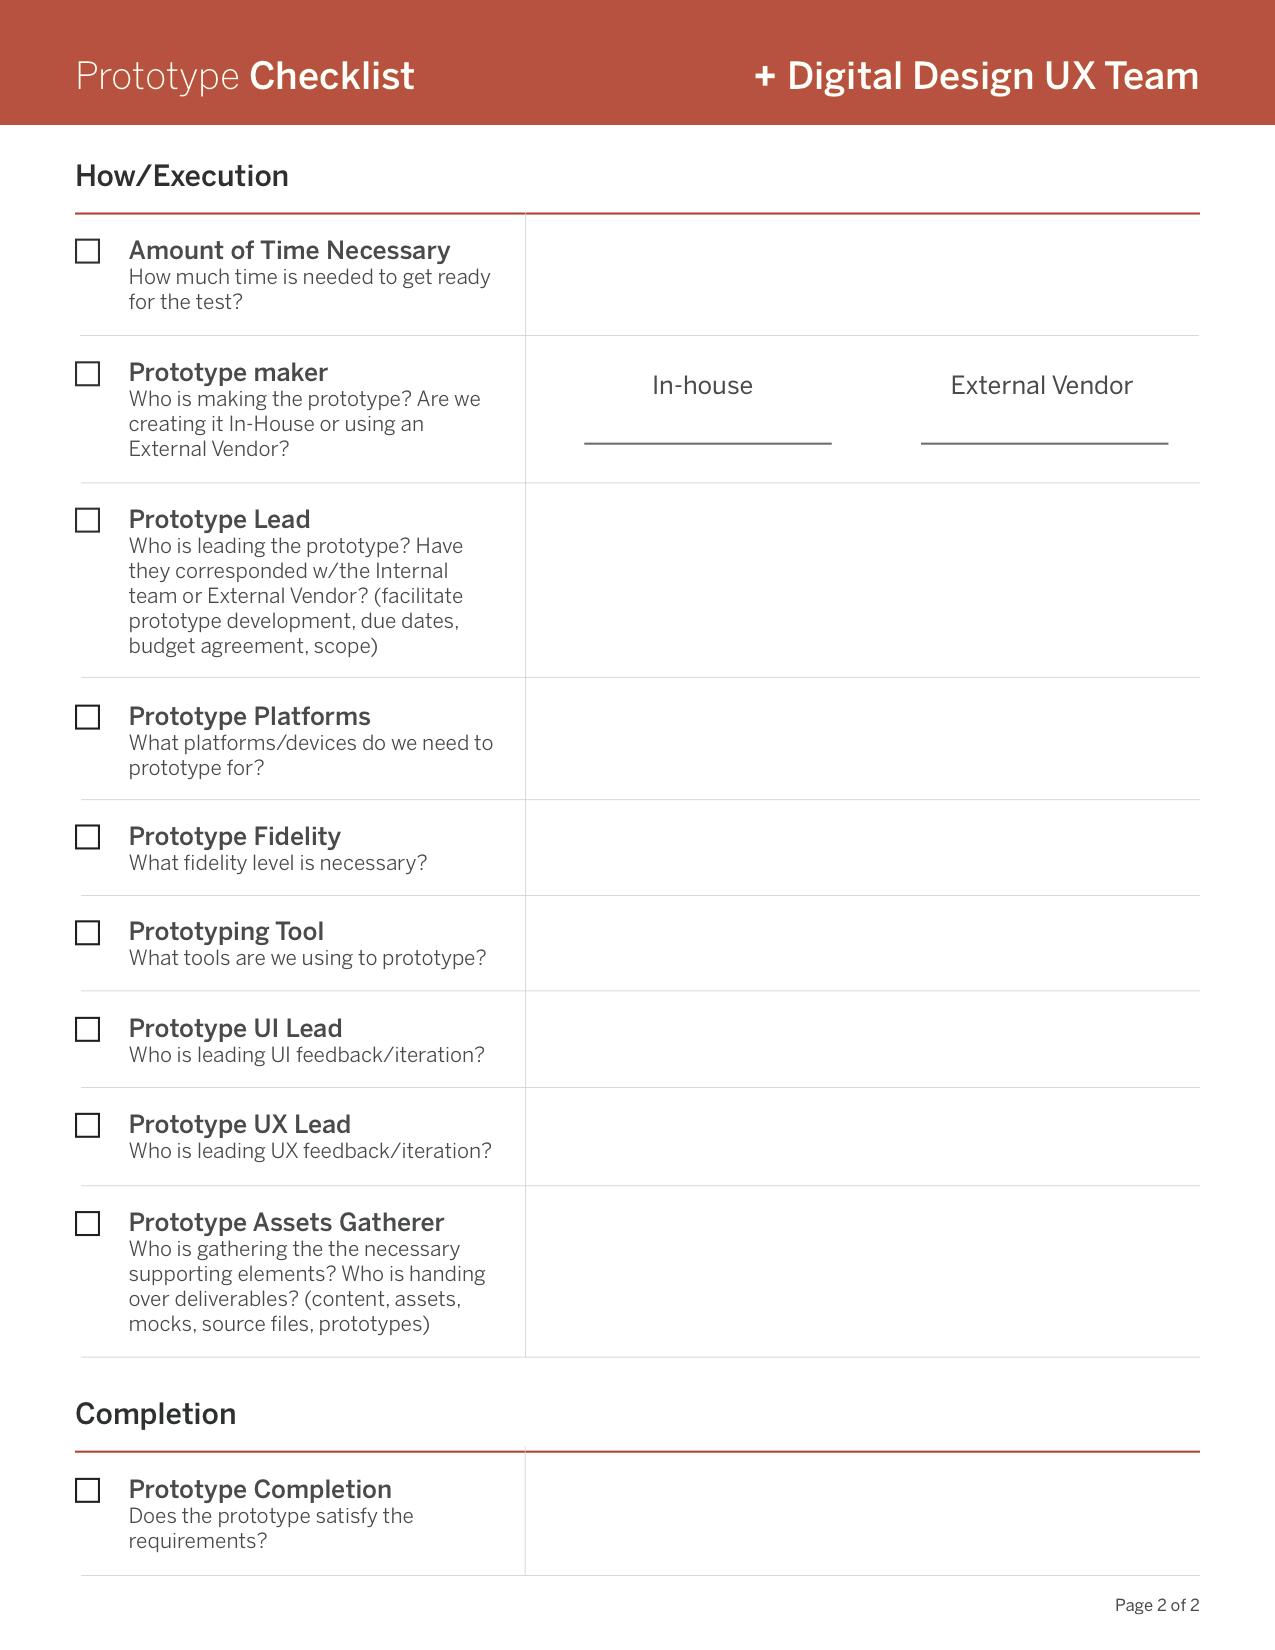 espn-ux-process-prototype-checklist.png